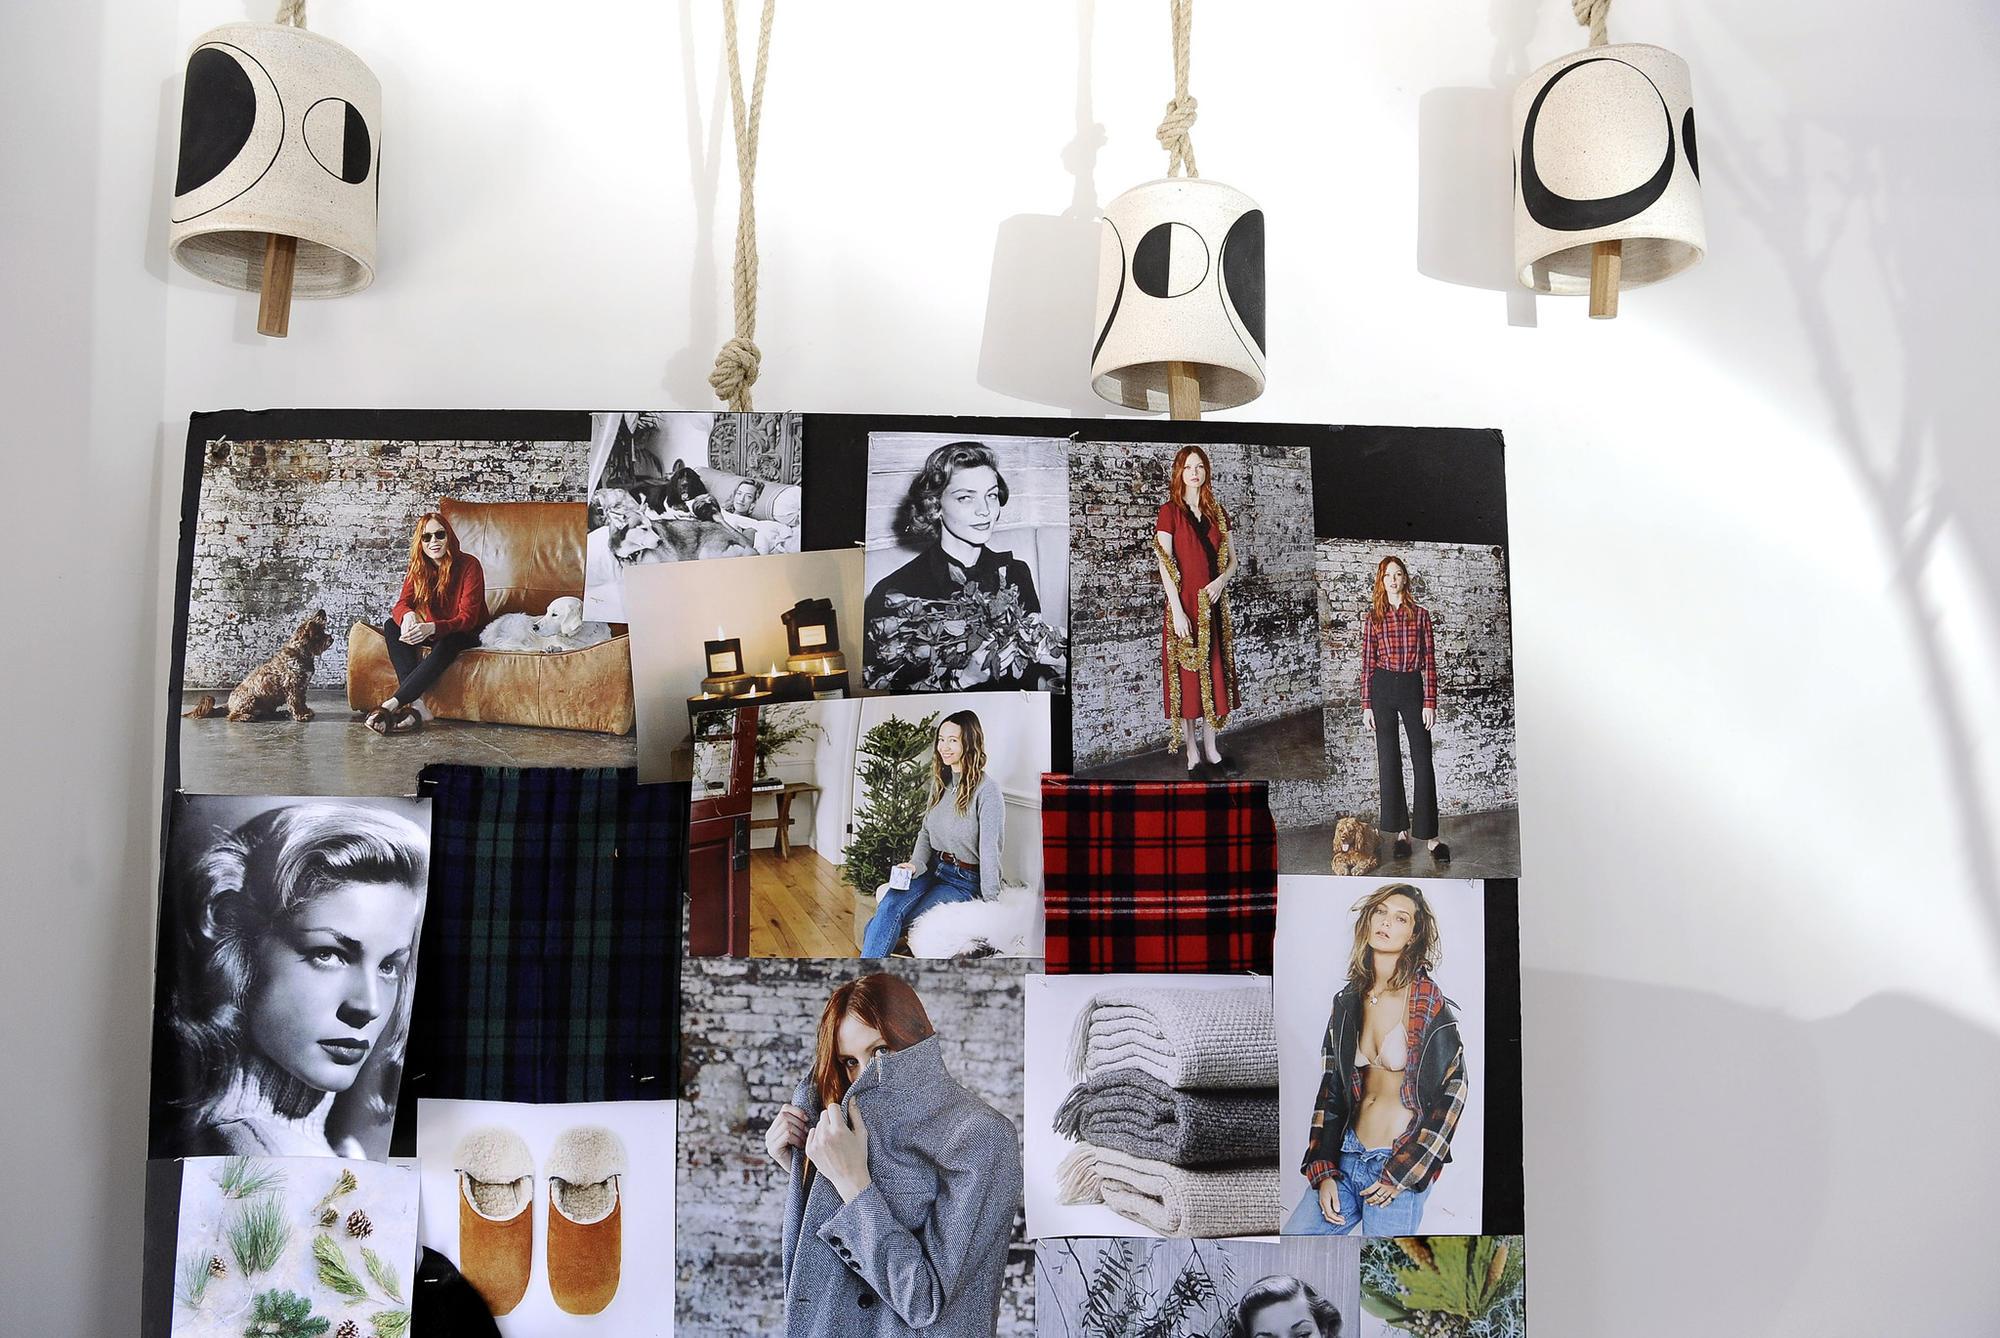 A look at a mood board created by designer Jenni Kayne.